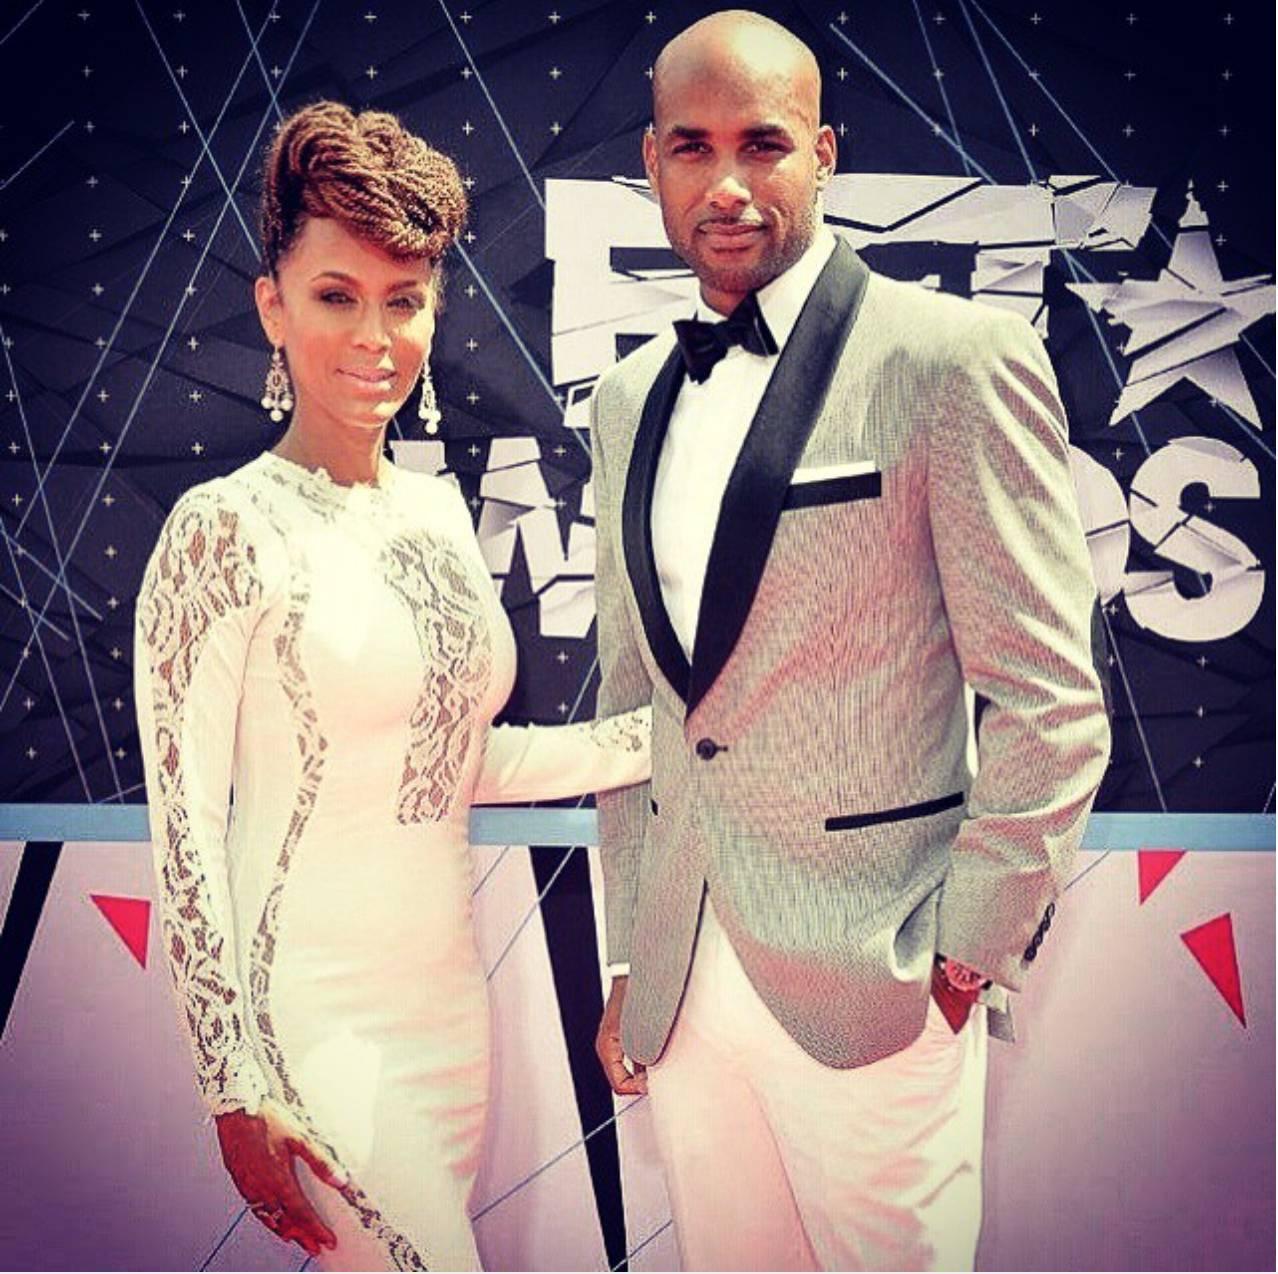 Boris and Nicole at BET Awards - Yes the two looked splendid at theAwards this year.  (Photo: Boris Kodjoe via Instagram)